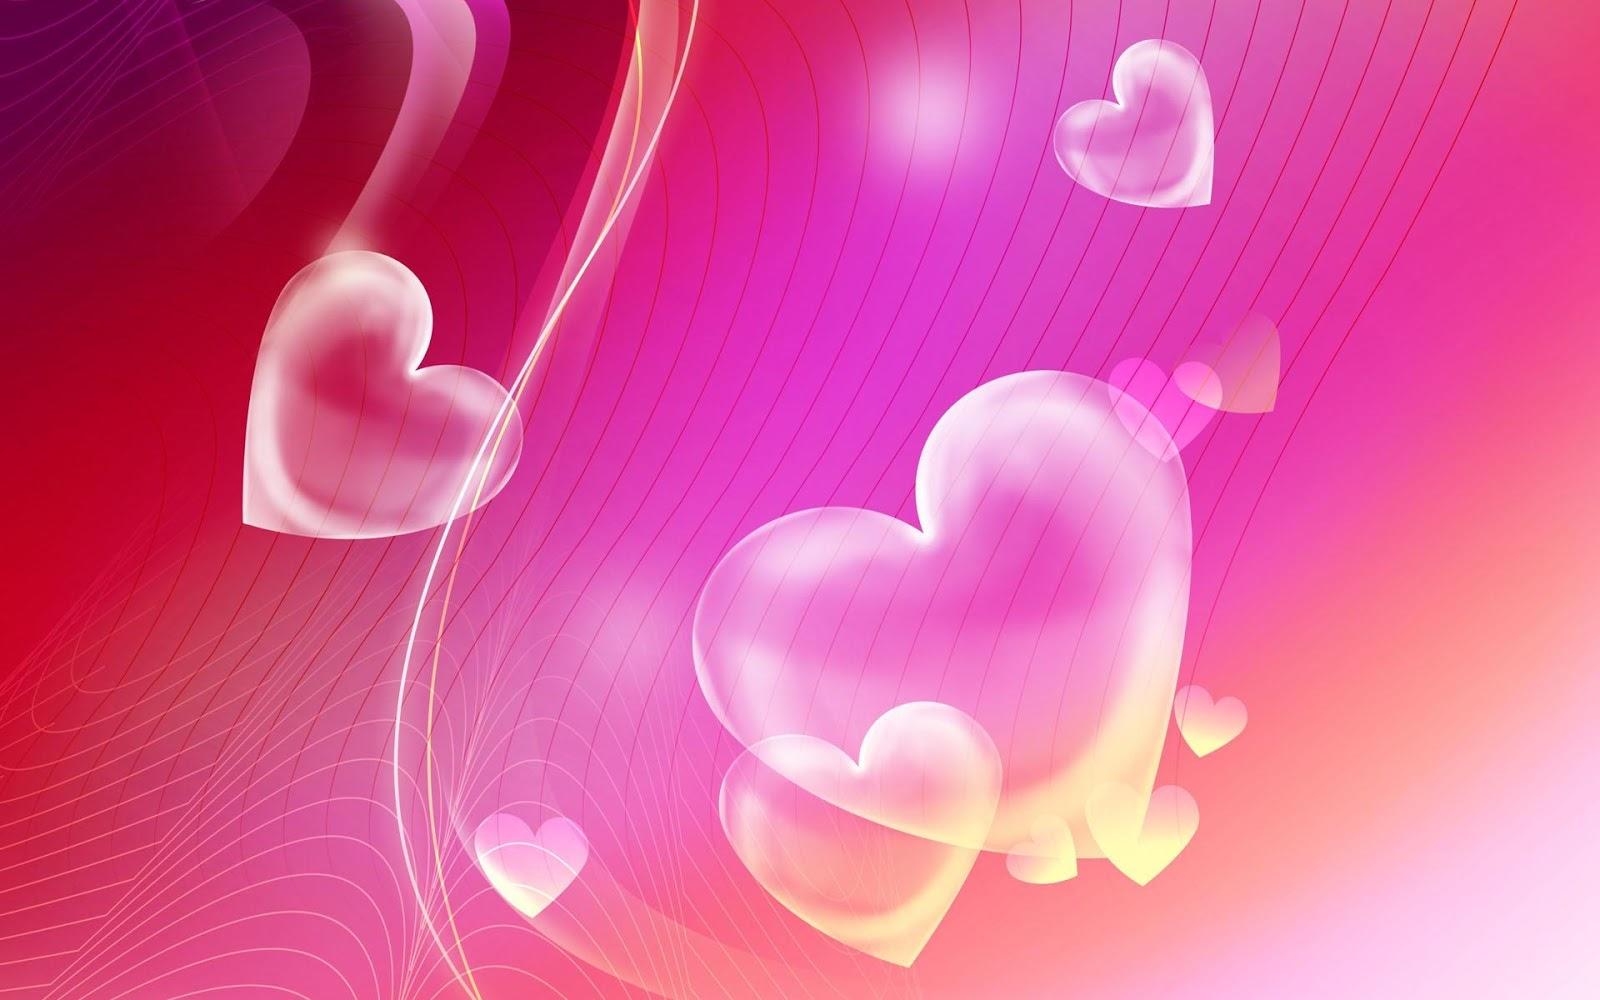 Fantastic Wallpaper Love Android - love-heart-wallpaper-for-android-6-widescreen-wallpaper  Image_931622.jpg